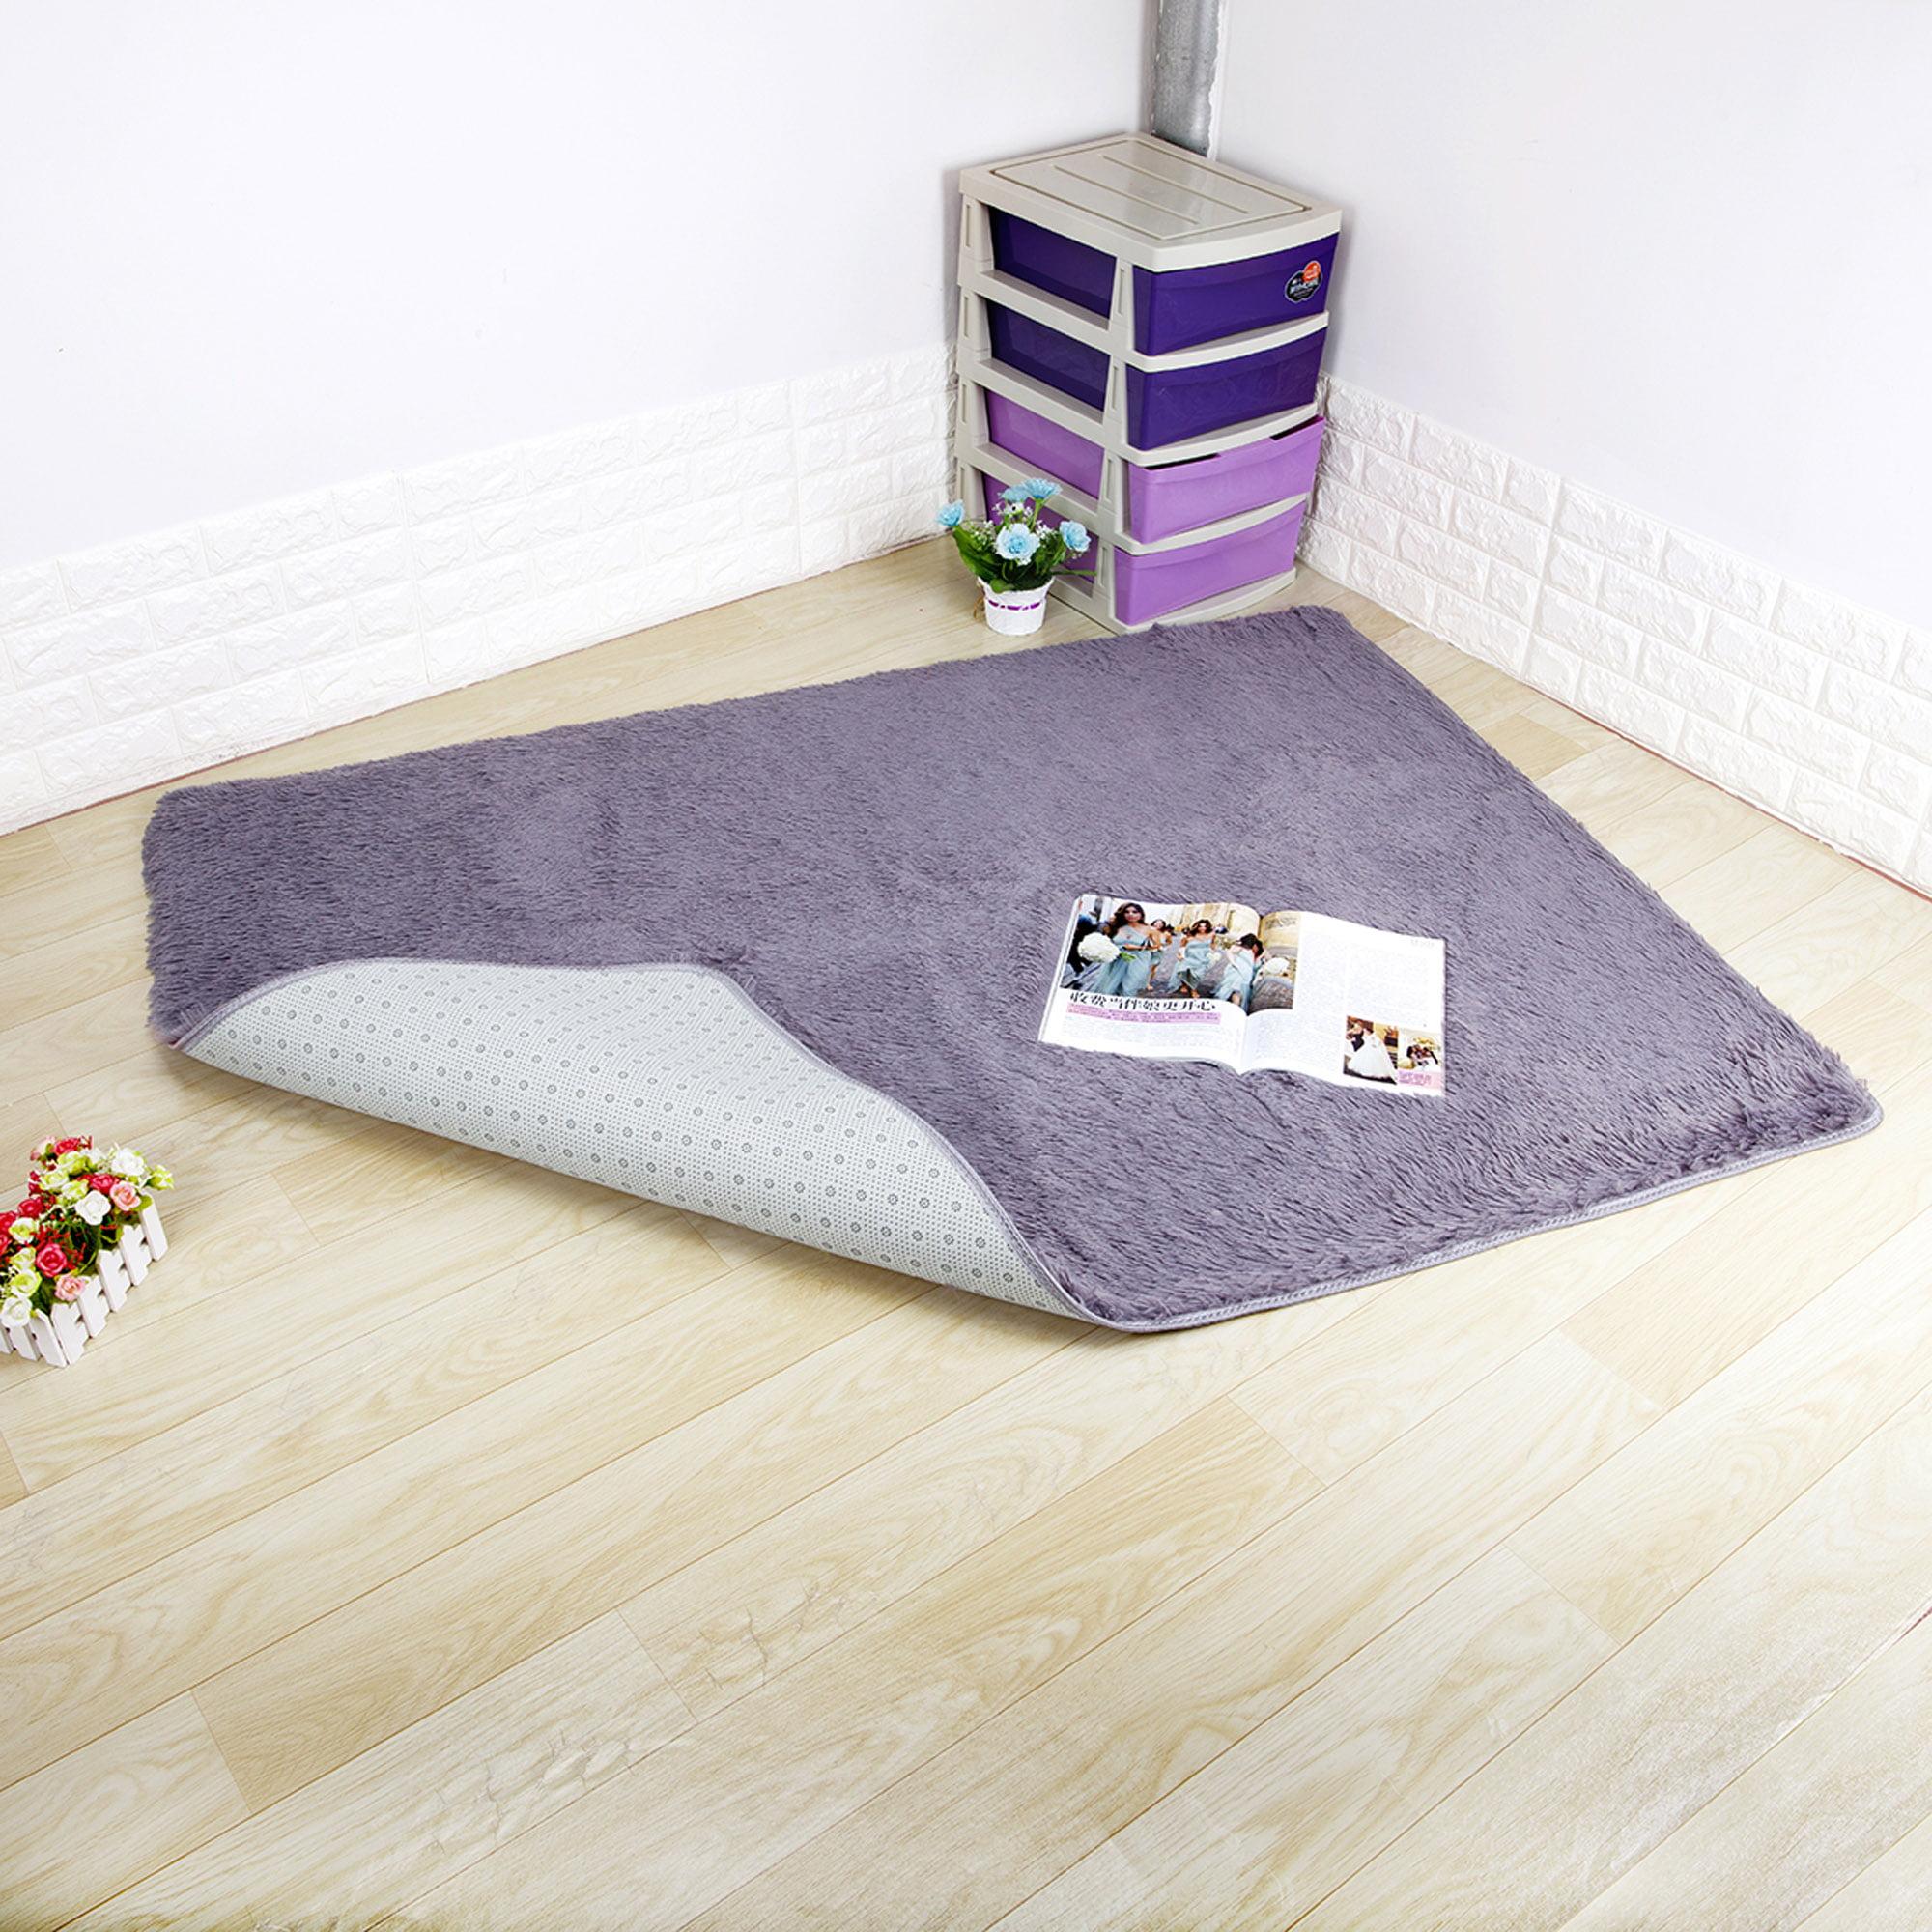 Picture of: Nk Home 2 6 X 5 3 2 6 X 3 9 Ultra Soft 4 5cm Velvet Bedroom Rugs Kids Room Carpet Modern Shaggy Area Rugs Home Decoration Black Blue Creamy Grey Gray Purple Hot Pink Pink Purple Walmart Com